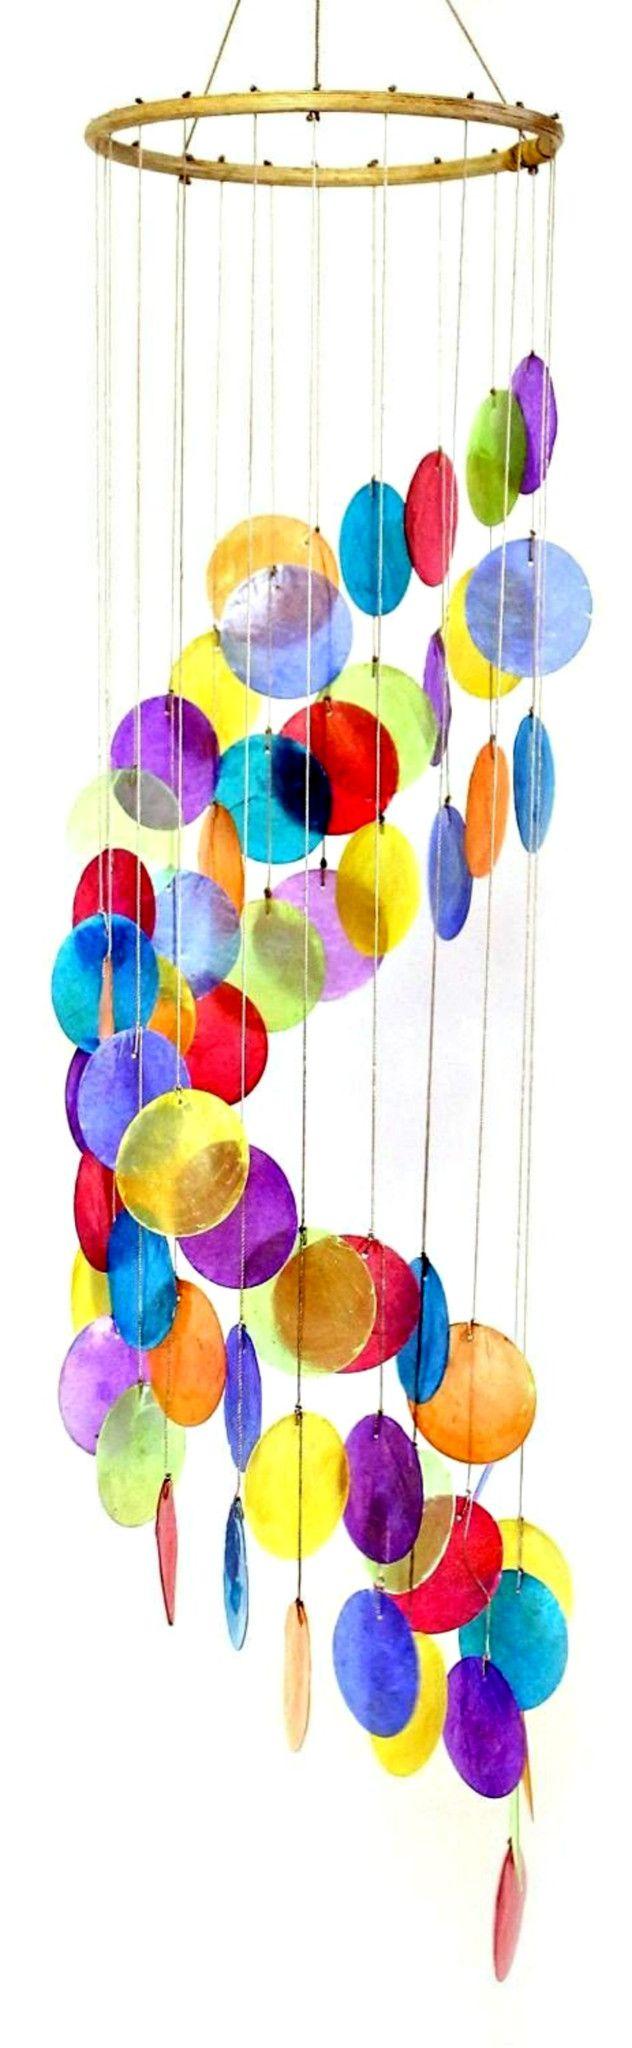 Rainbow Colored Spiral Capiz Chime Windchime Suncatcher